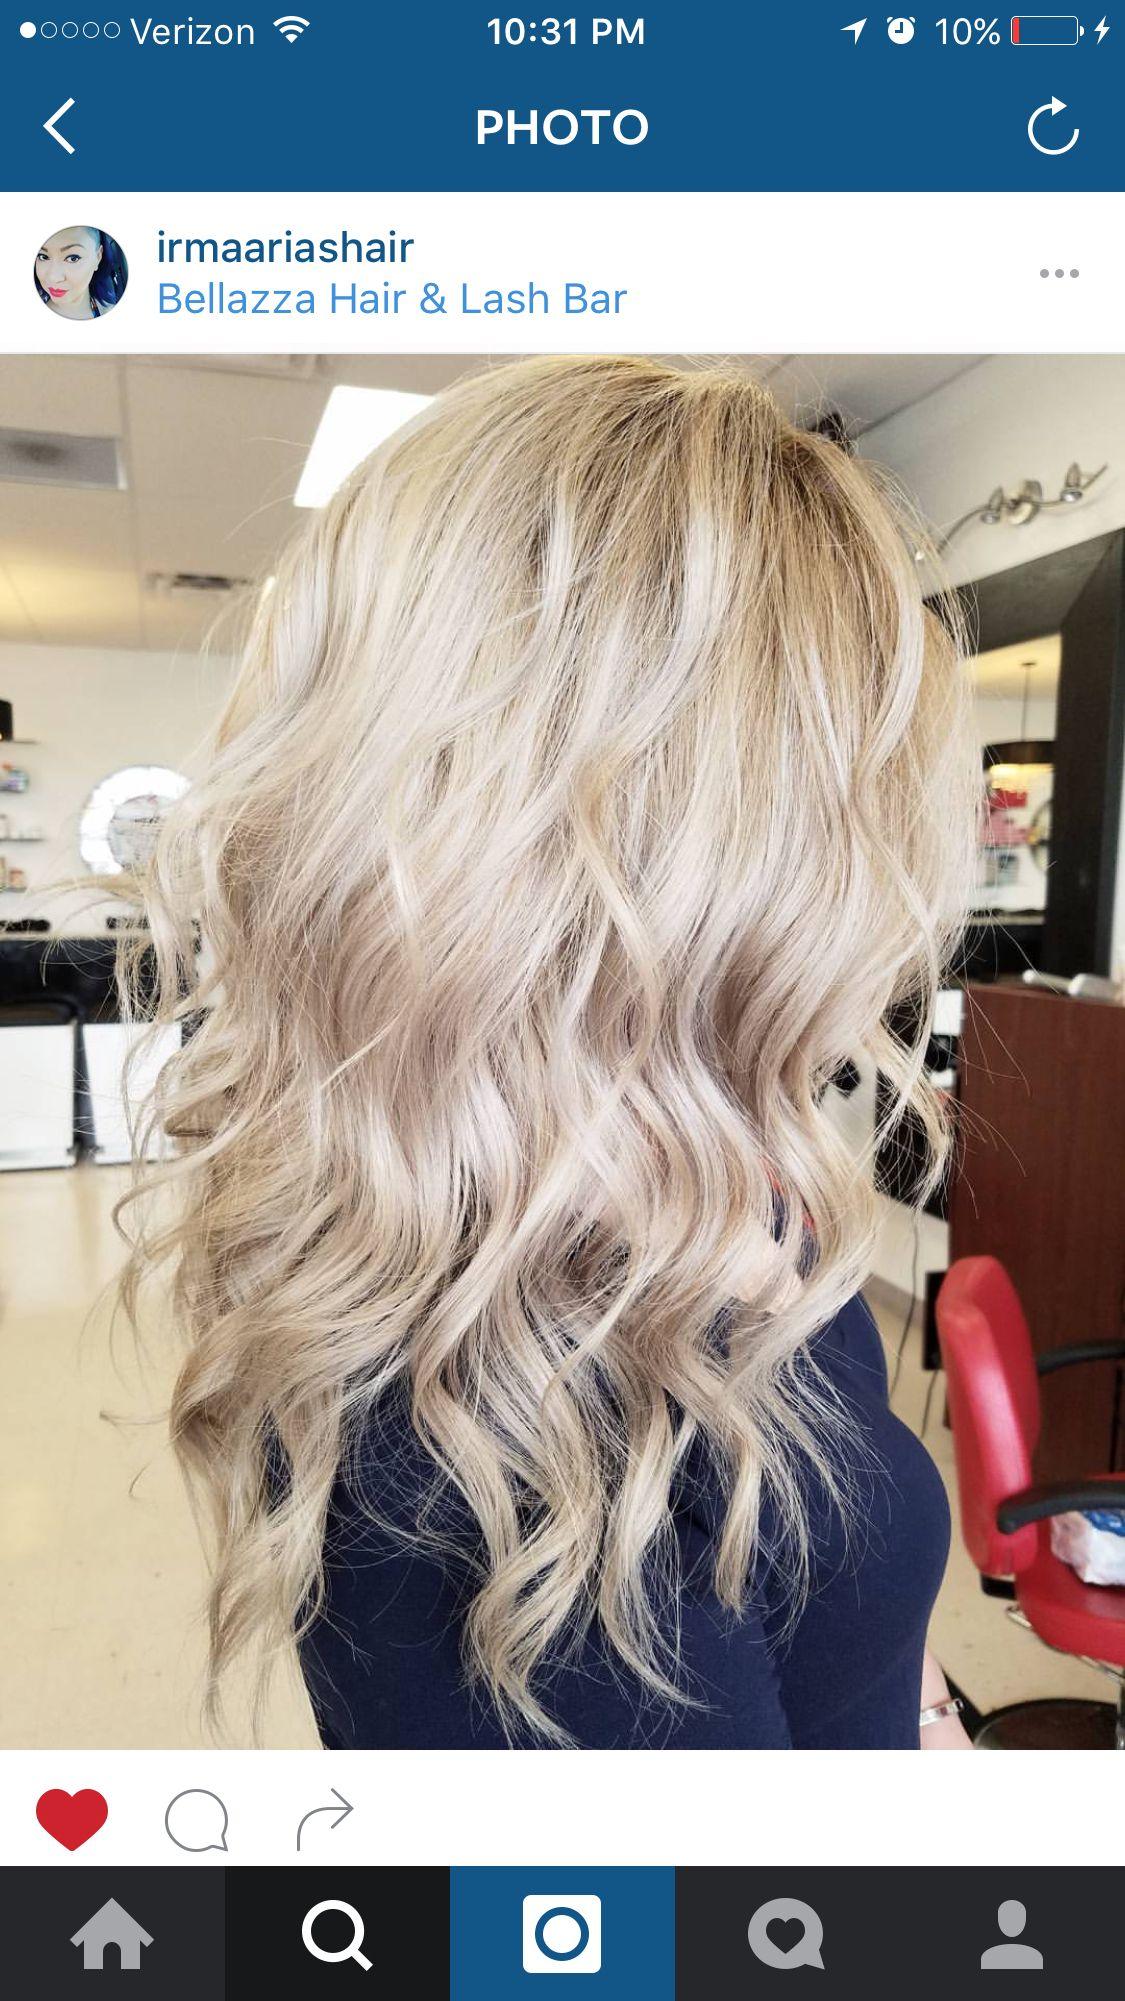 All over blonde blondehair myhairdresserisbetterthanyours hair